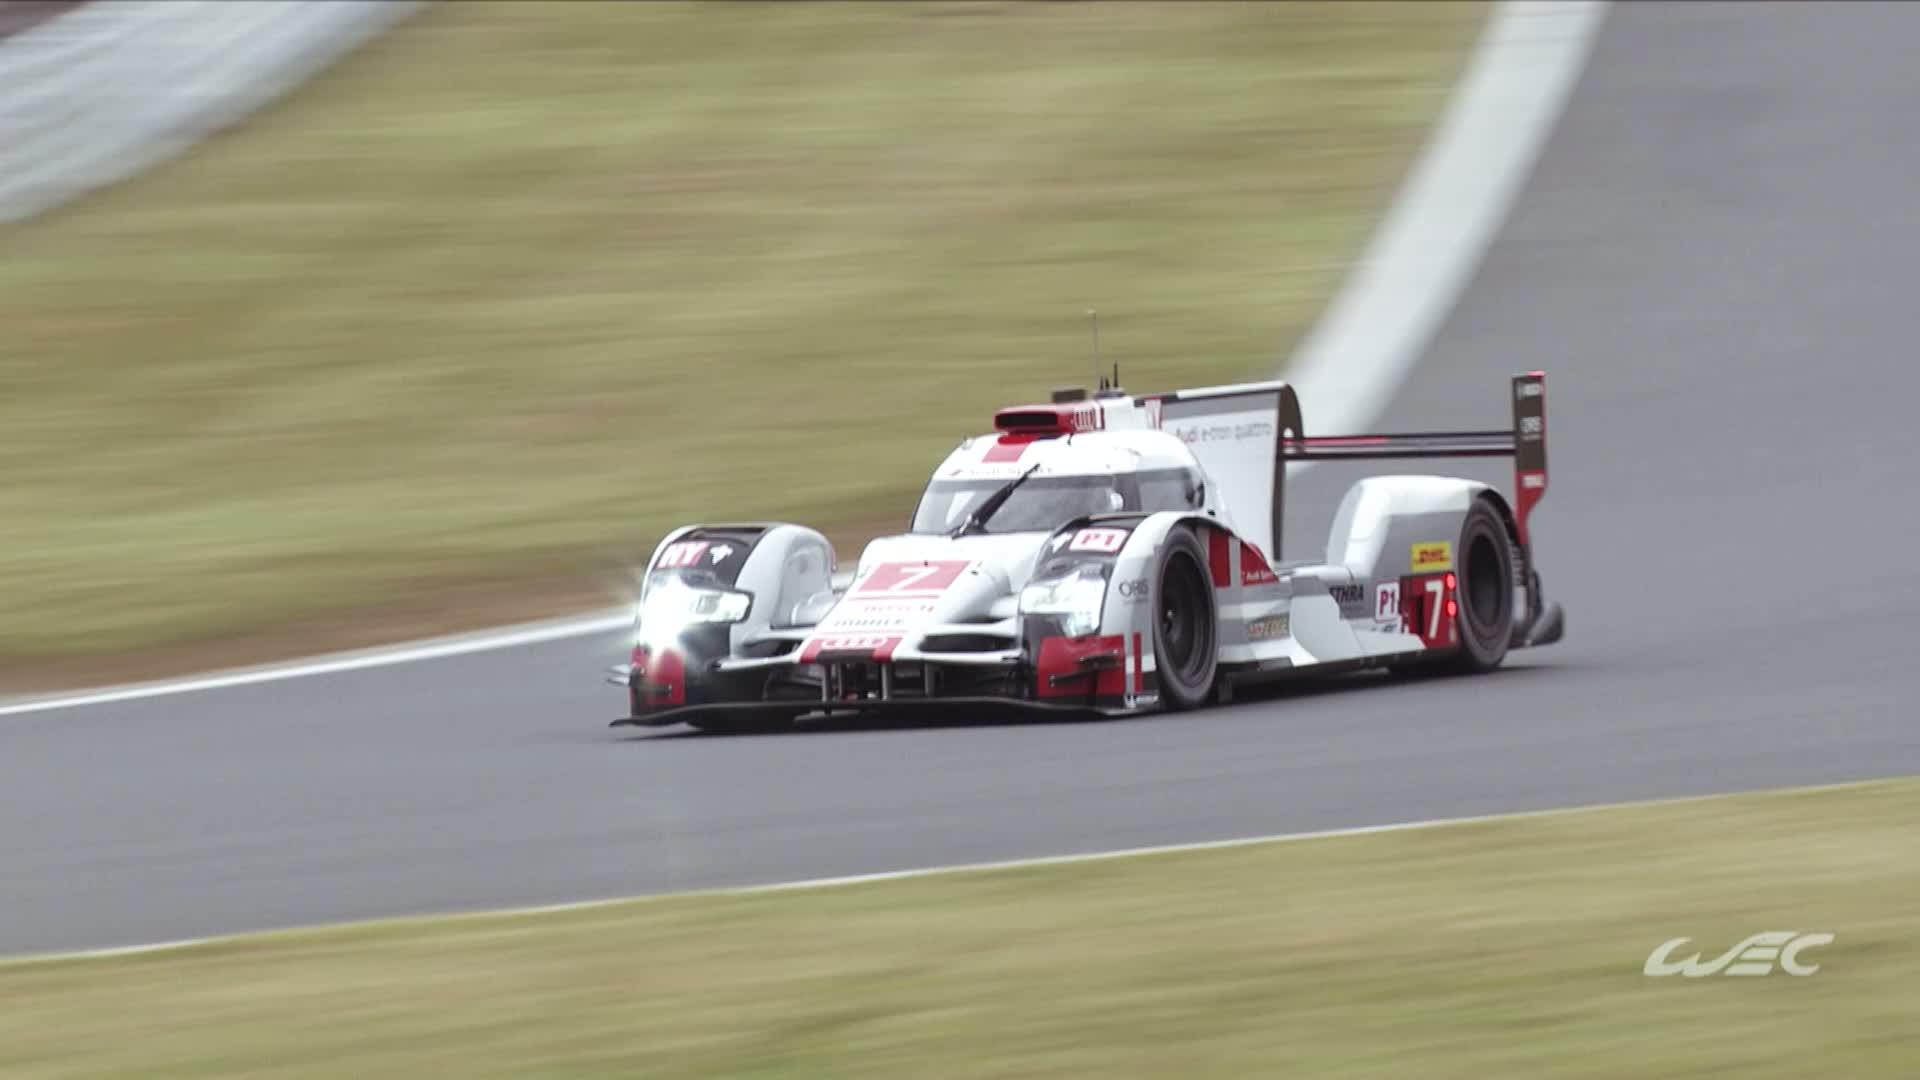 60 Seconds of Audi Sport 91/2015 - WEC Fuji, Qualifying